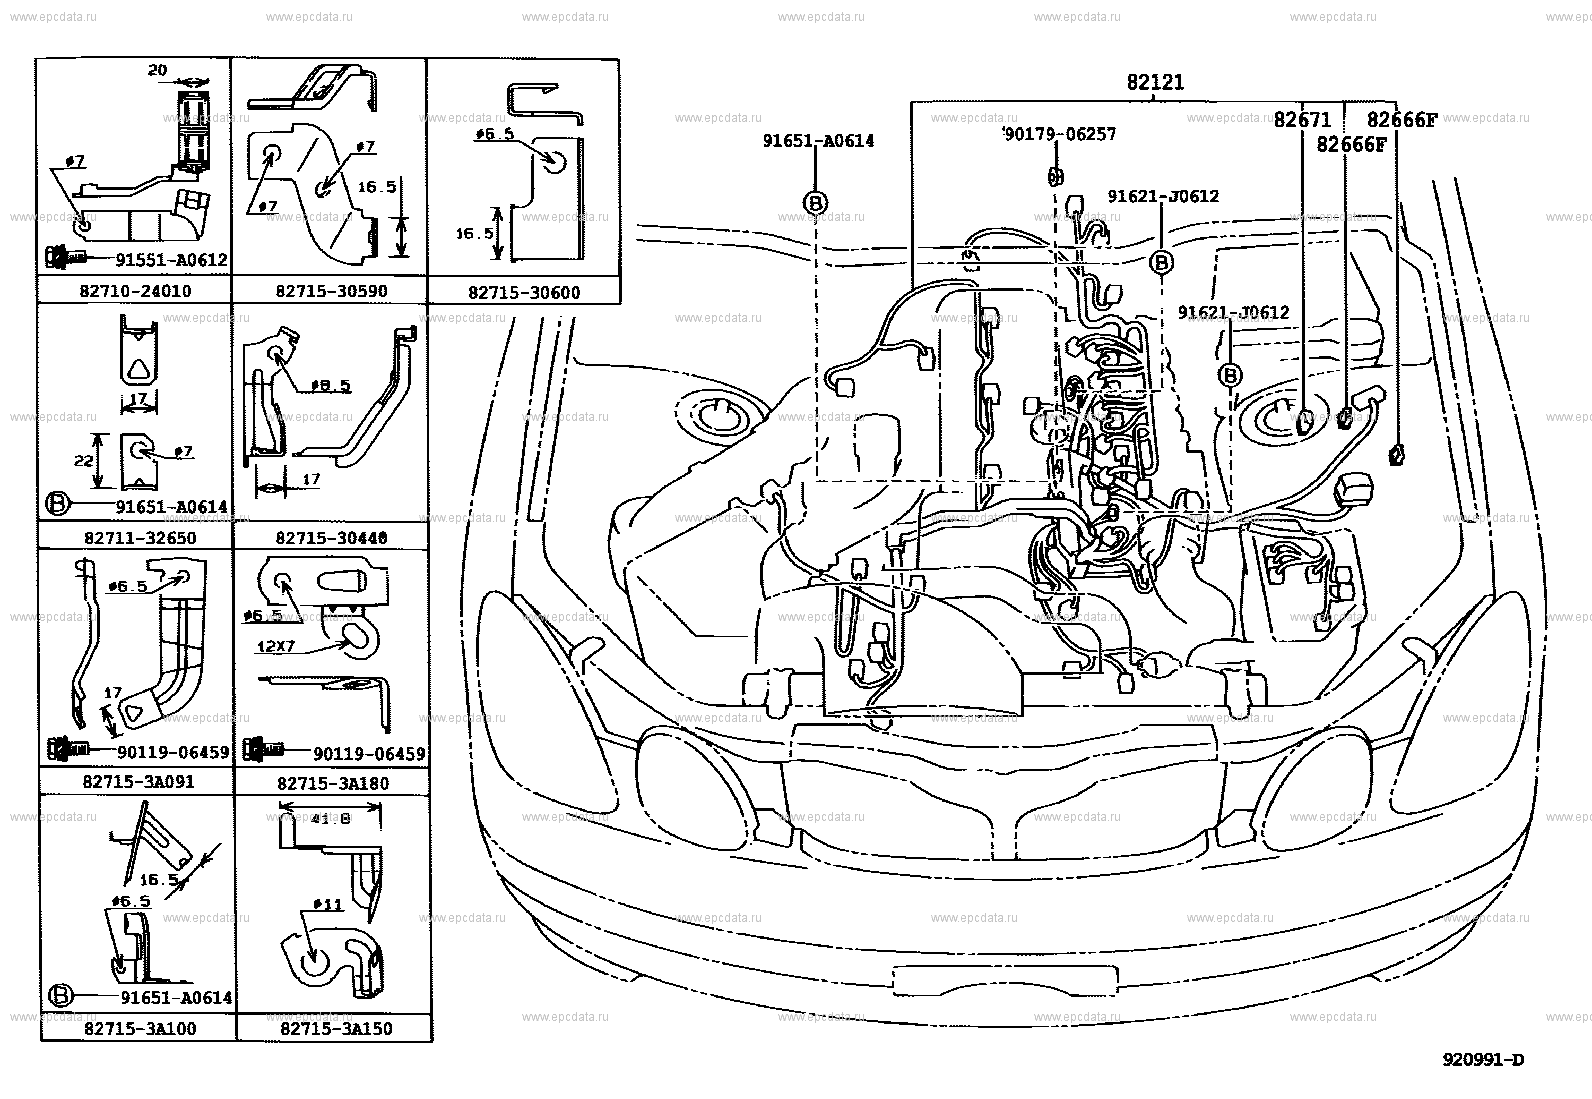 Wiring & clamp for Toyota Aristo JZS161 - Genuine parts